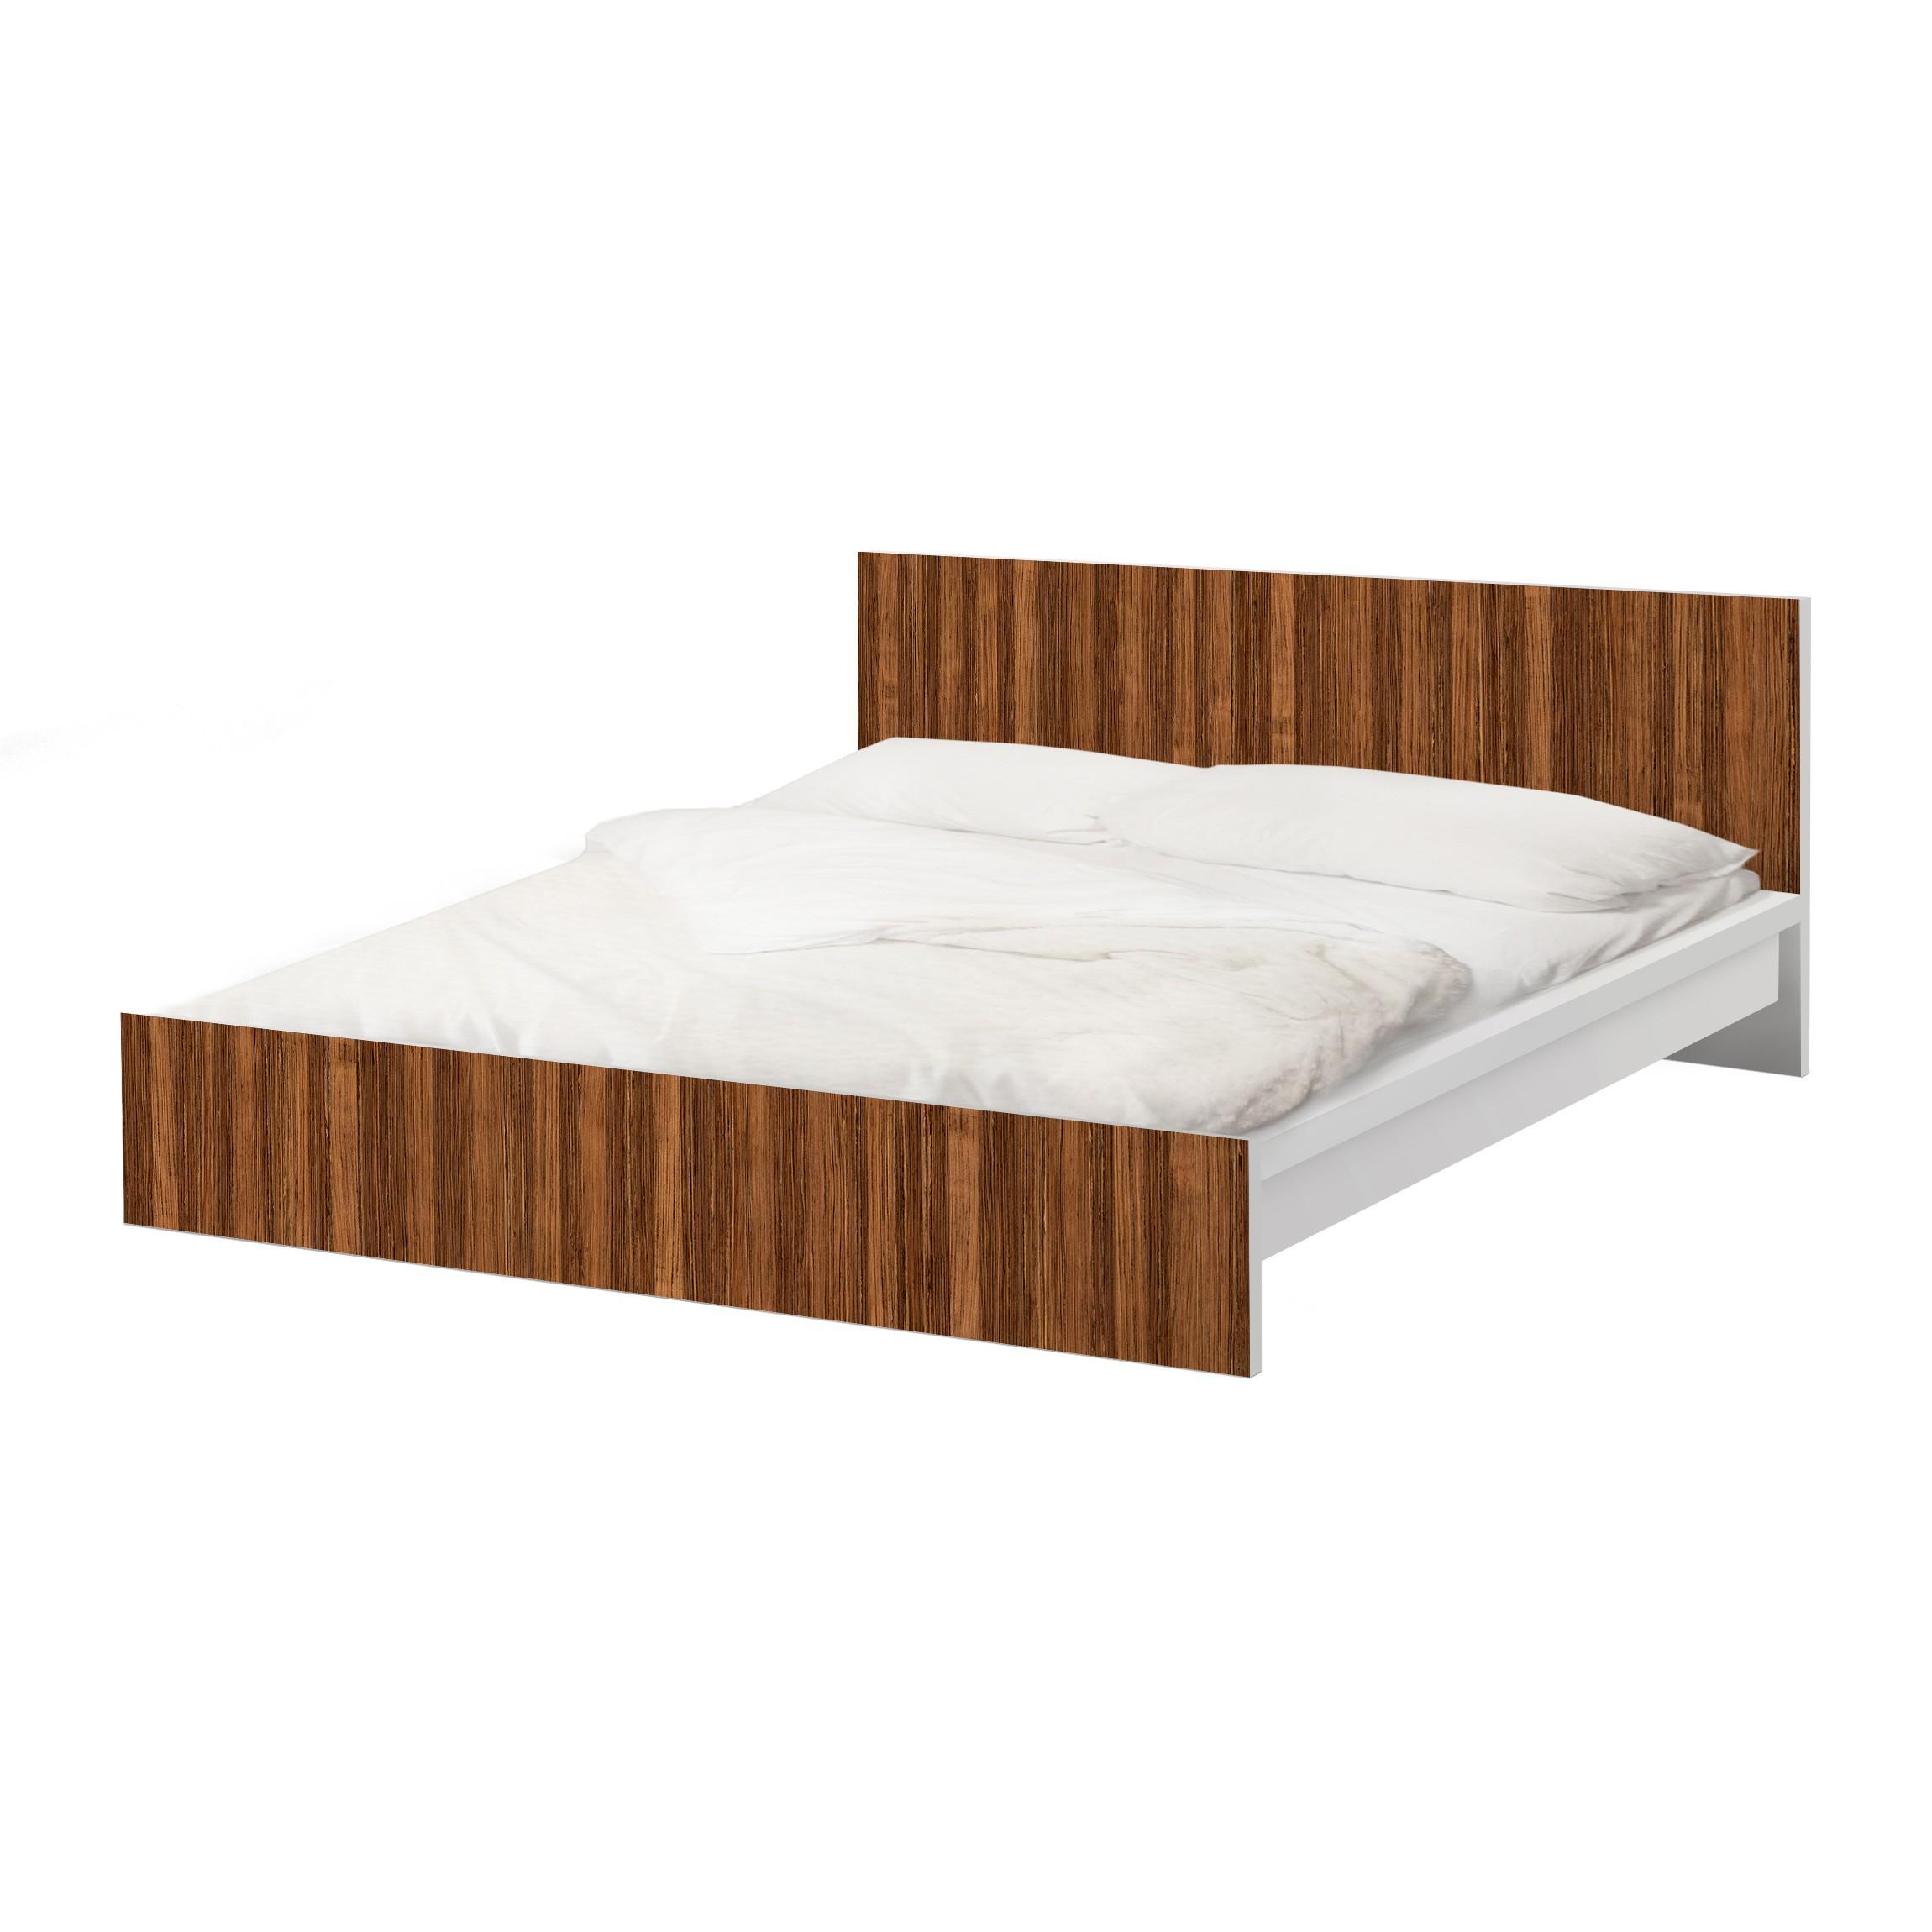 m belfolie f r ikea malm bett niedrig 180x200cm klebefolie amazakou. Black Bedroom Furniture Sets. Home Design Ideas